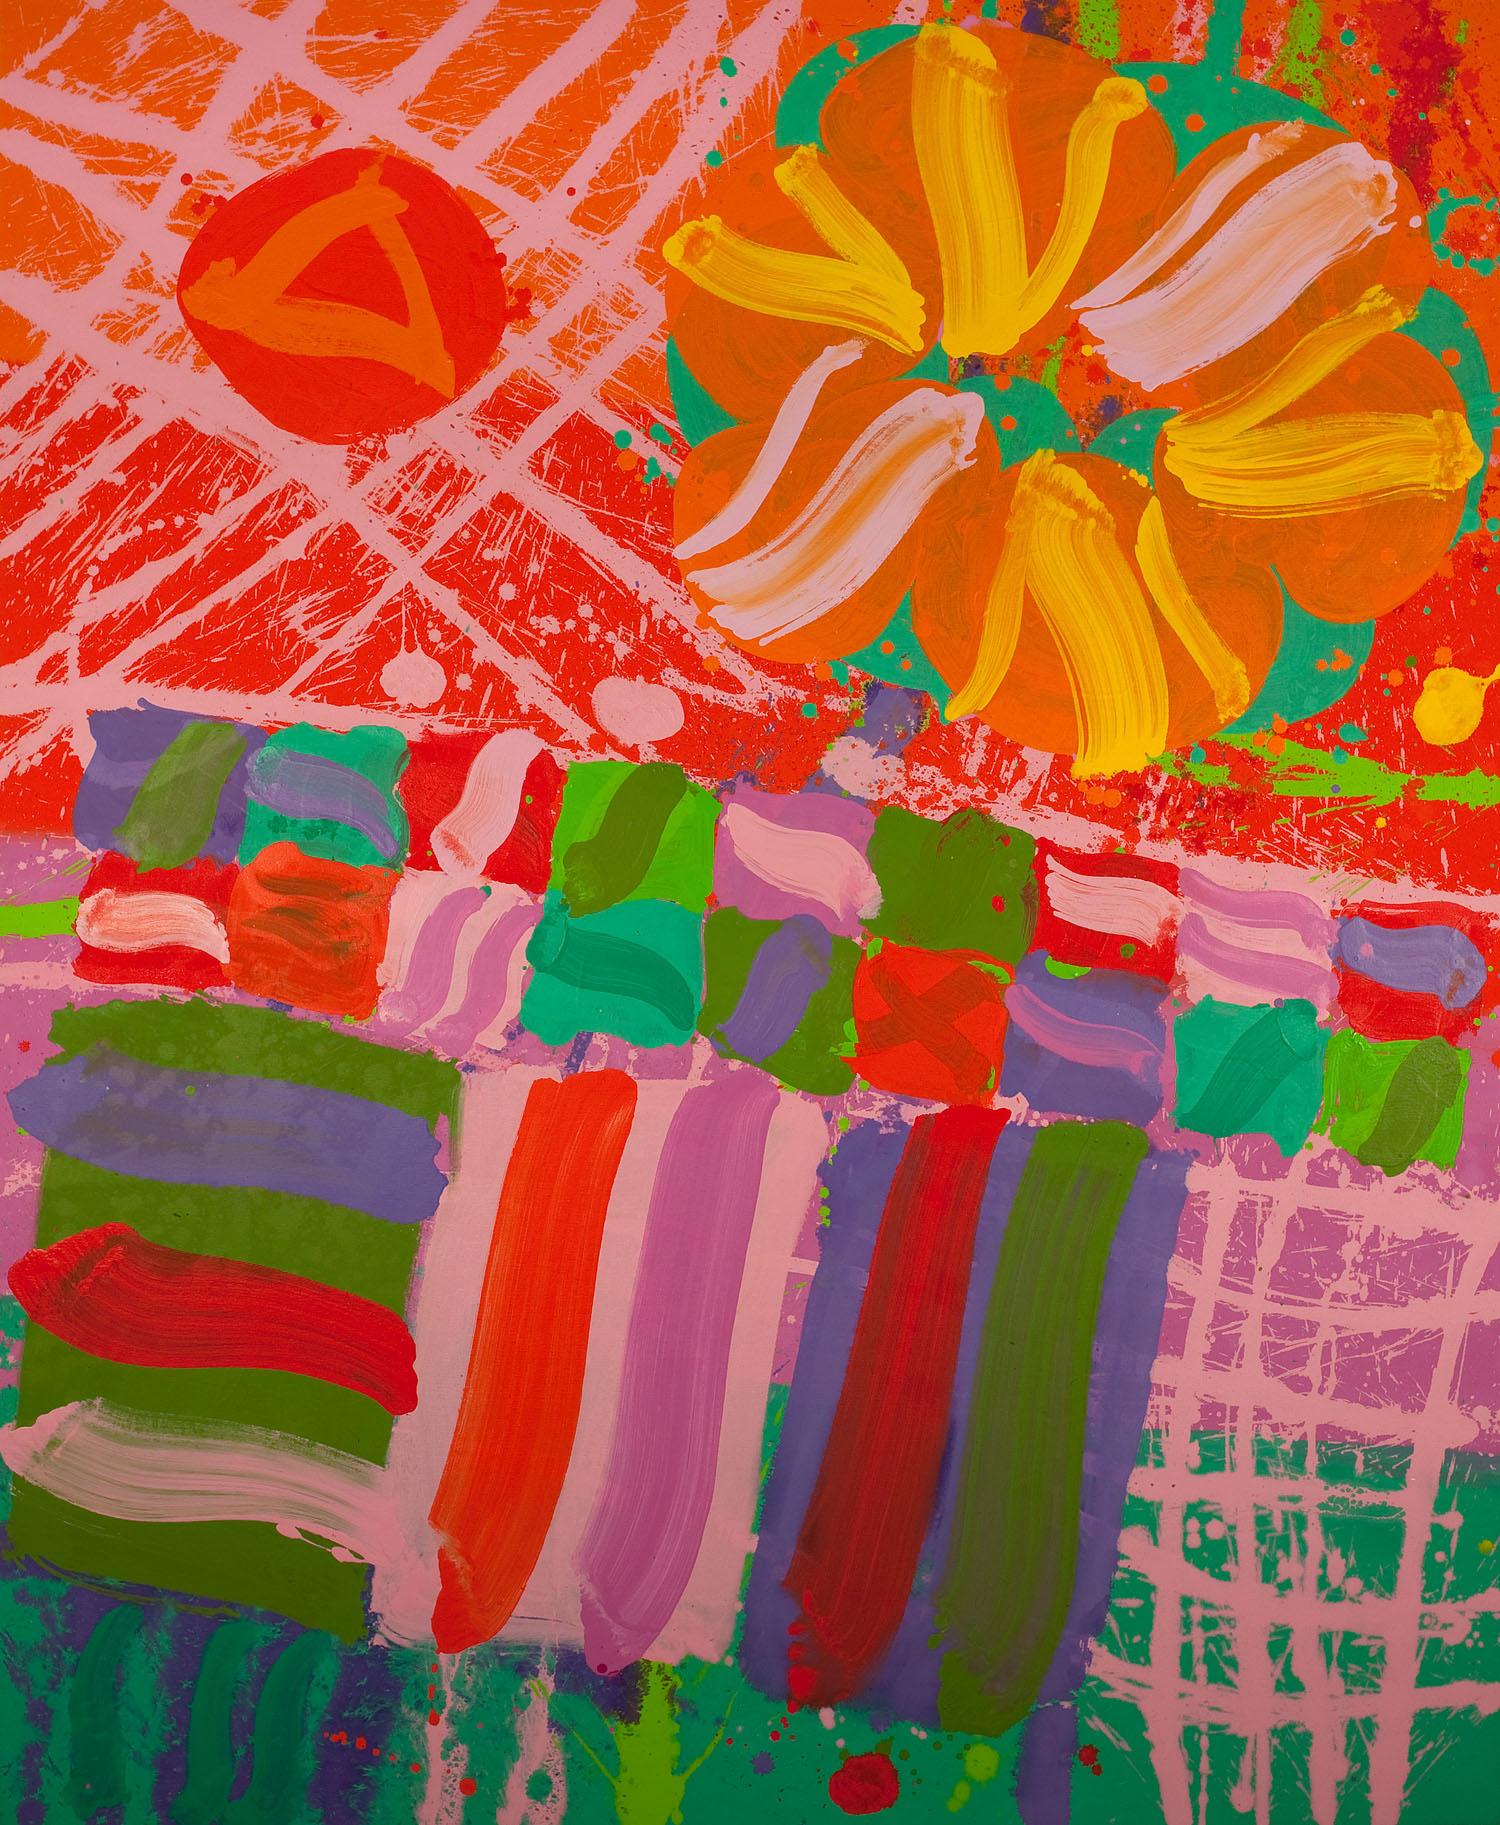 Albert Irvin 'Hope' 2010 acrylic on canvas 183x153cm.jpg